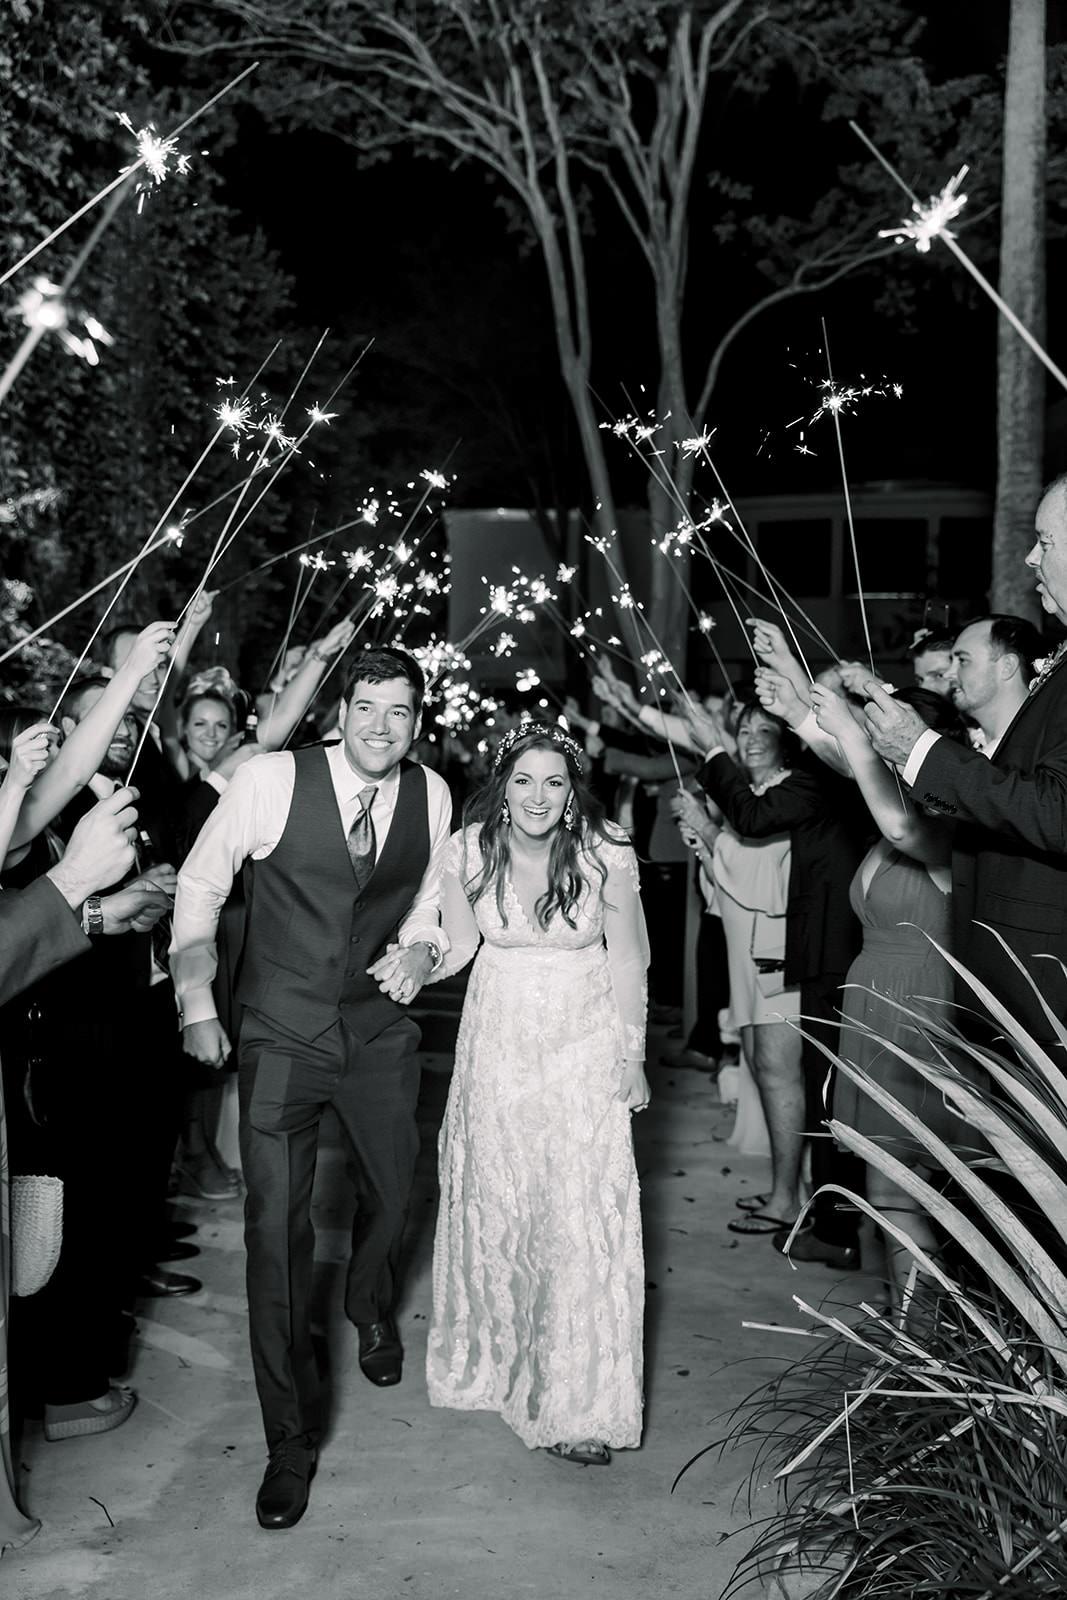 Boho Inspired Florida Bride and Groom Black and White Wedding Sparkler Exit Portrait | Tampa Bay Wedding Photographers Shauna and Jordon Photography